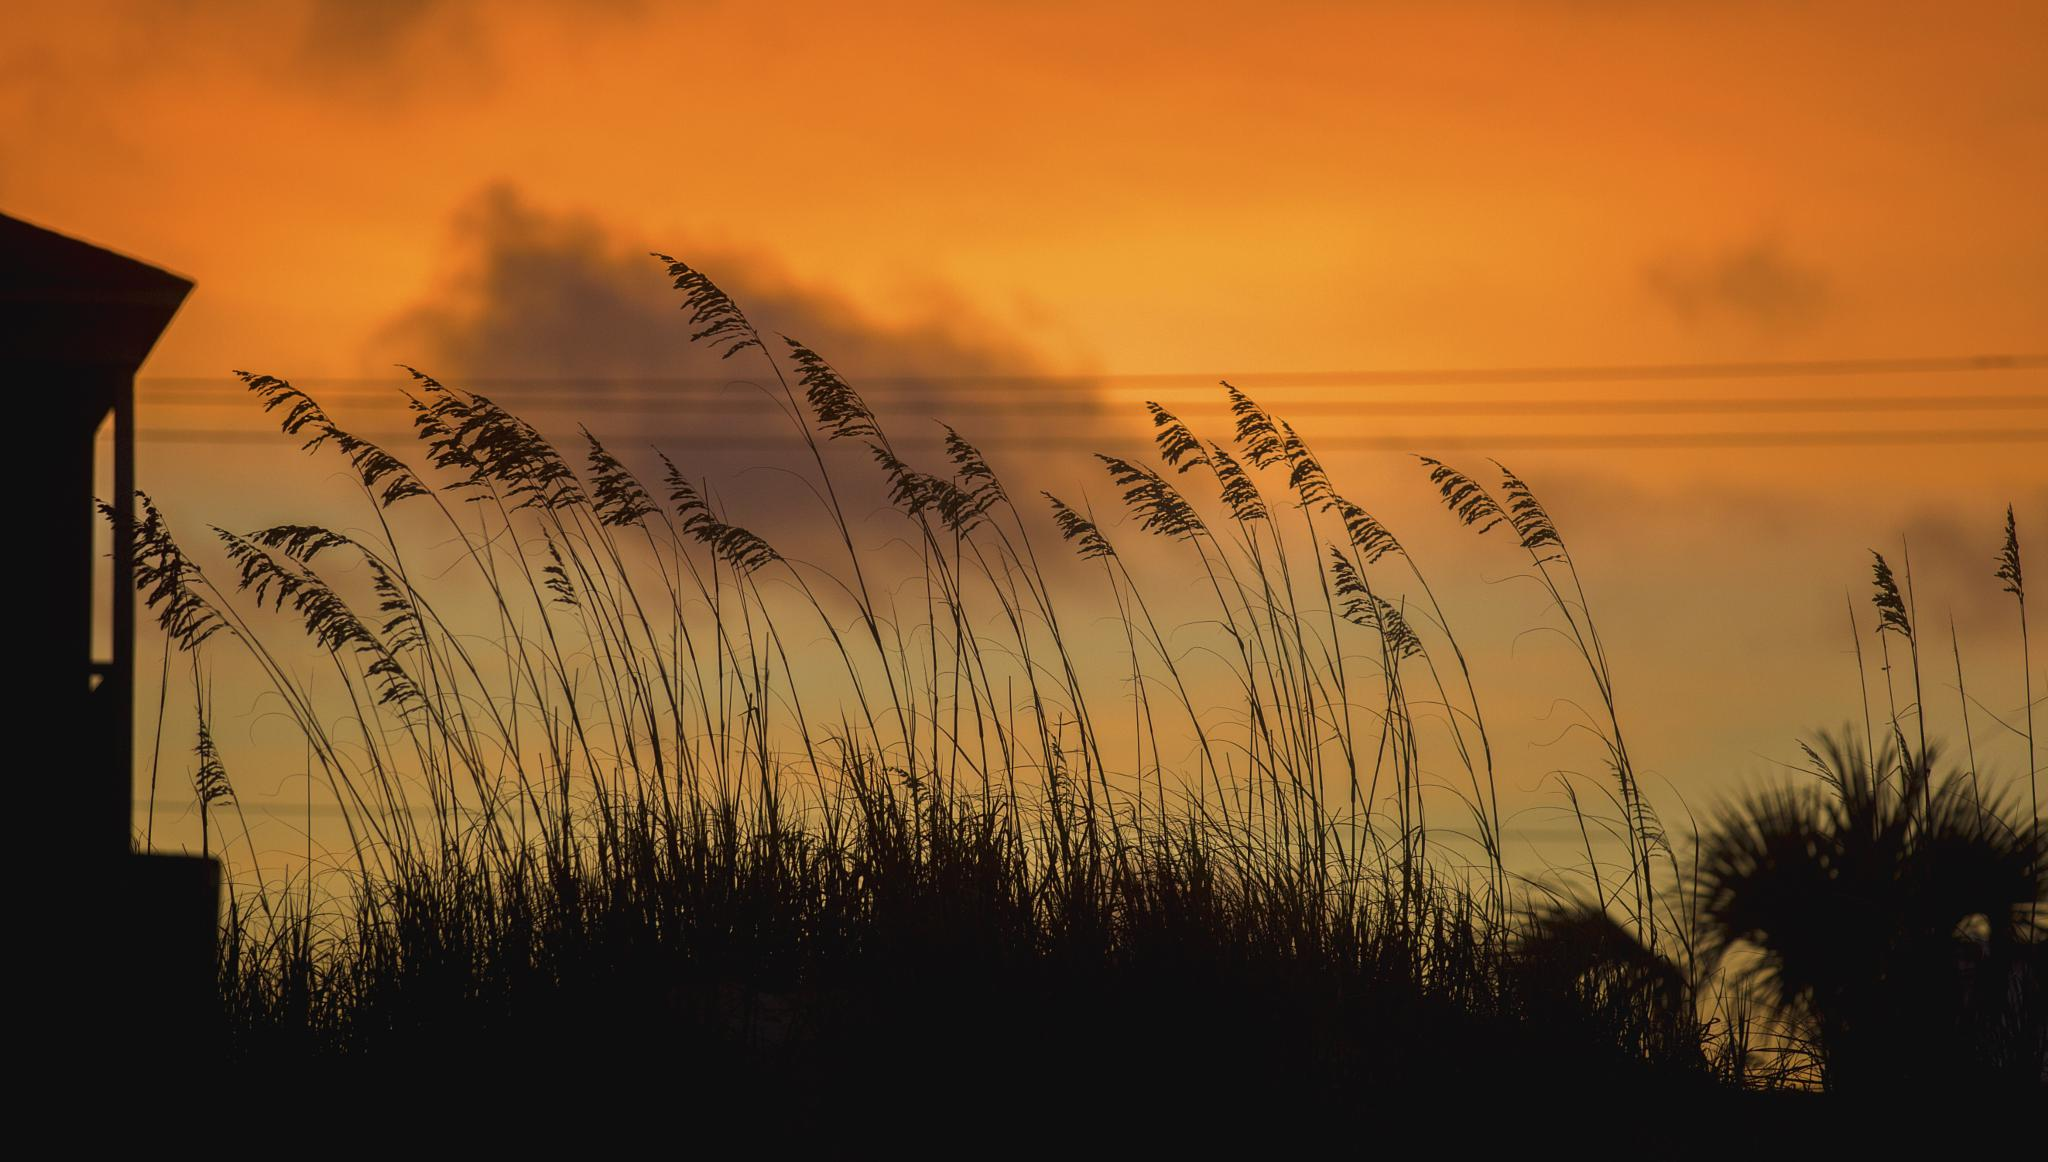 A Beach Sunset by Bill Killillay